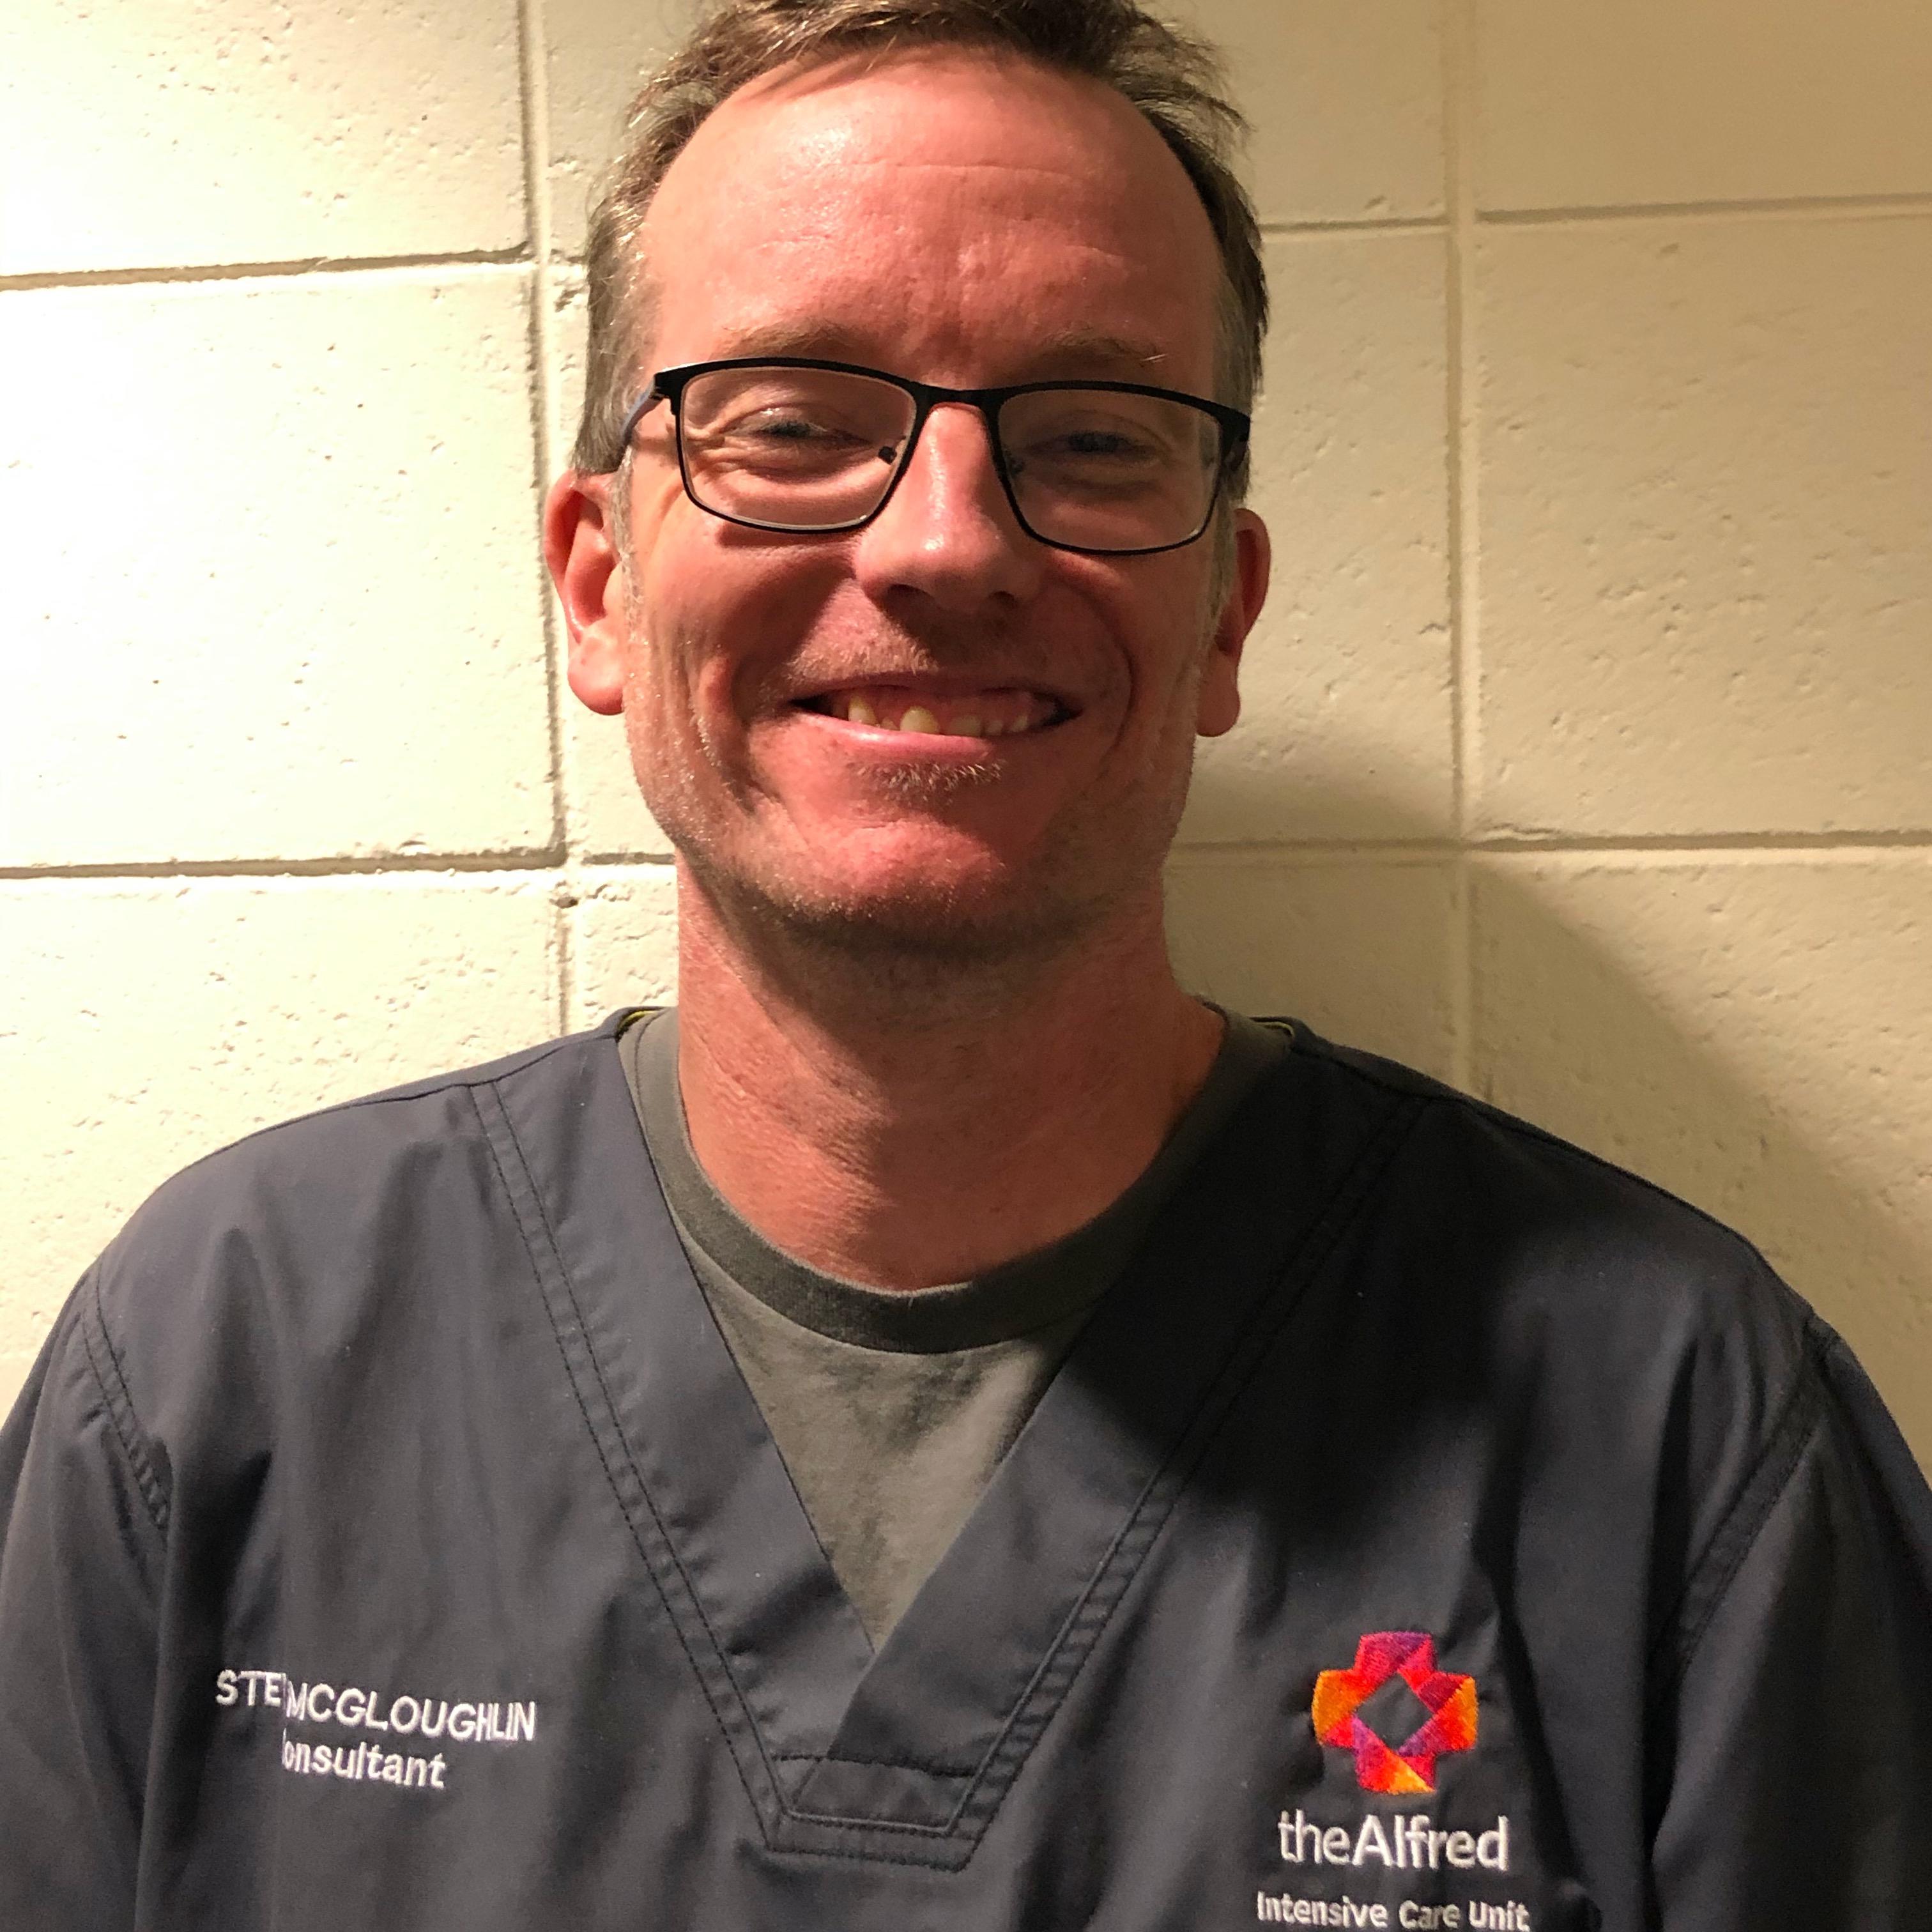 Episode 59: Steve McGloughlin - Preparing for the COVID-19 pandemic